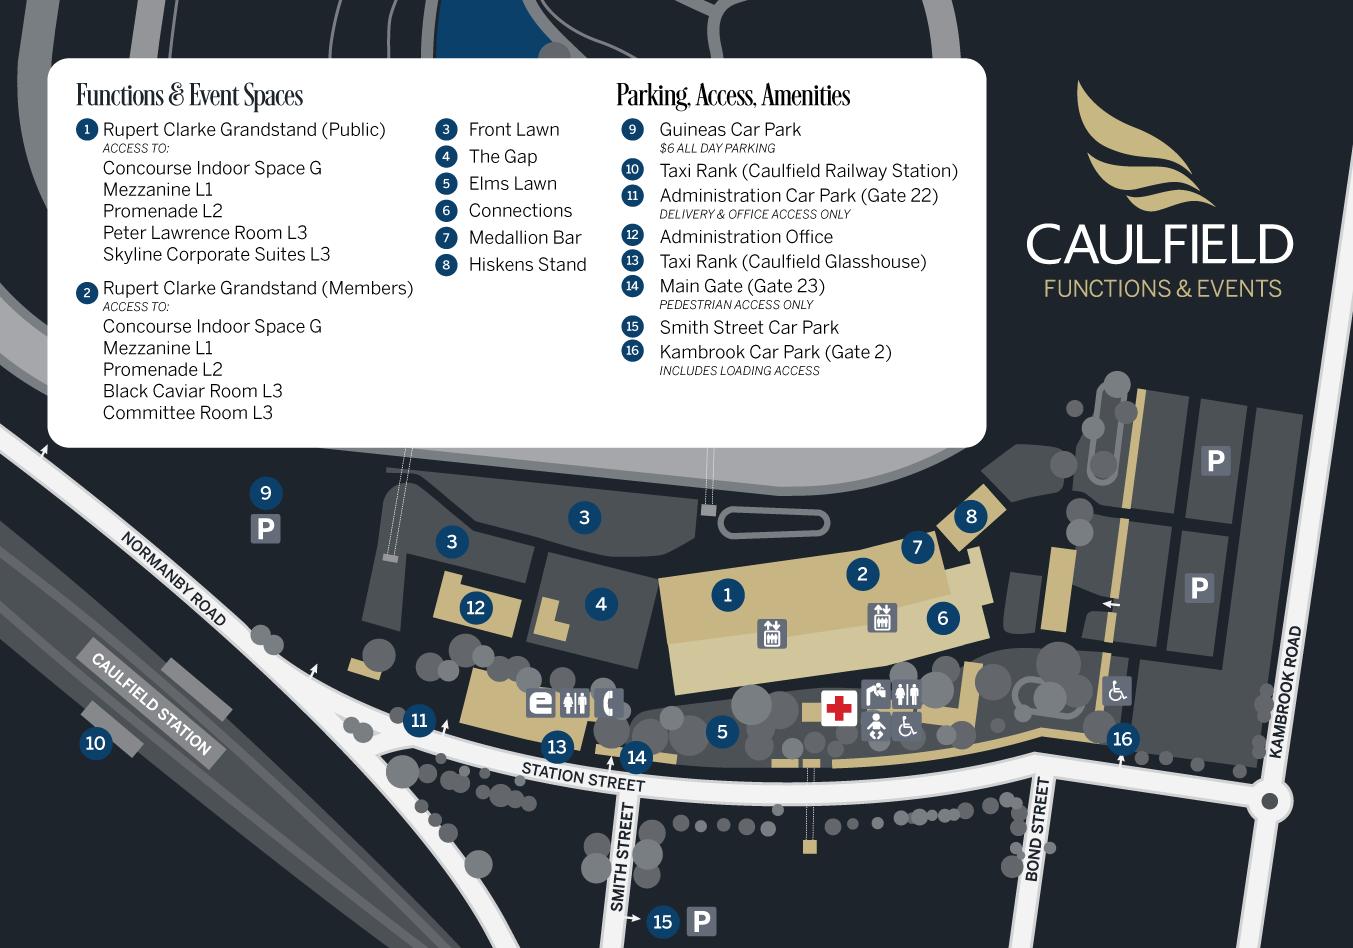 Gate 23 Caulfield Racecourse